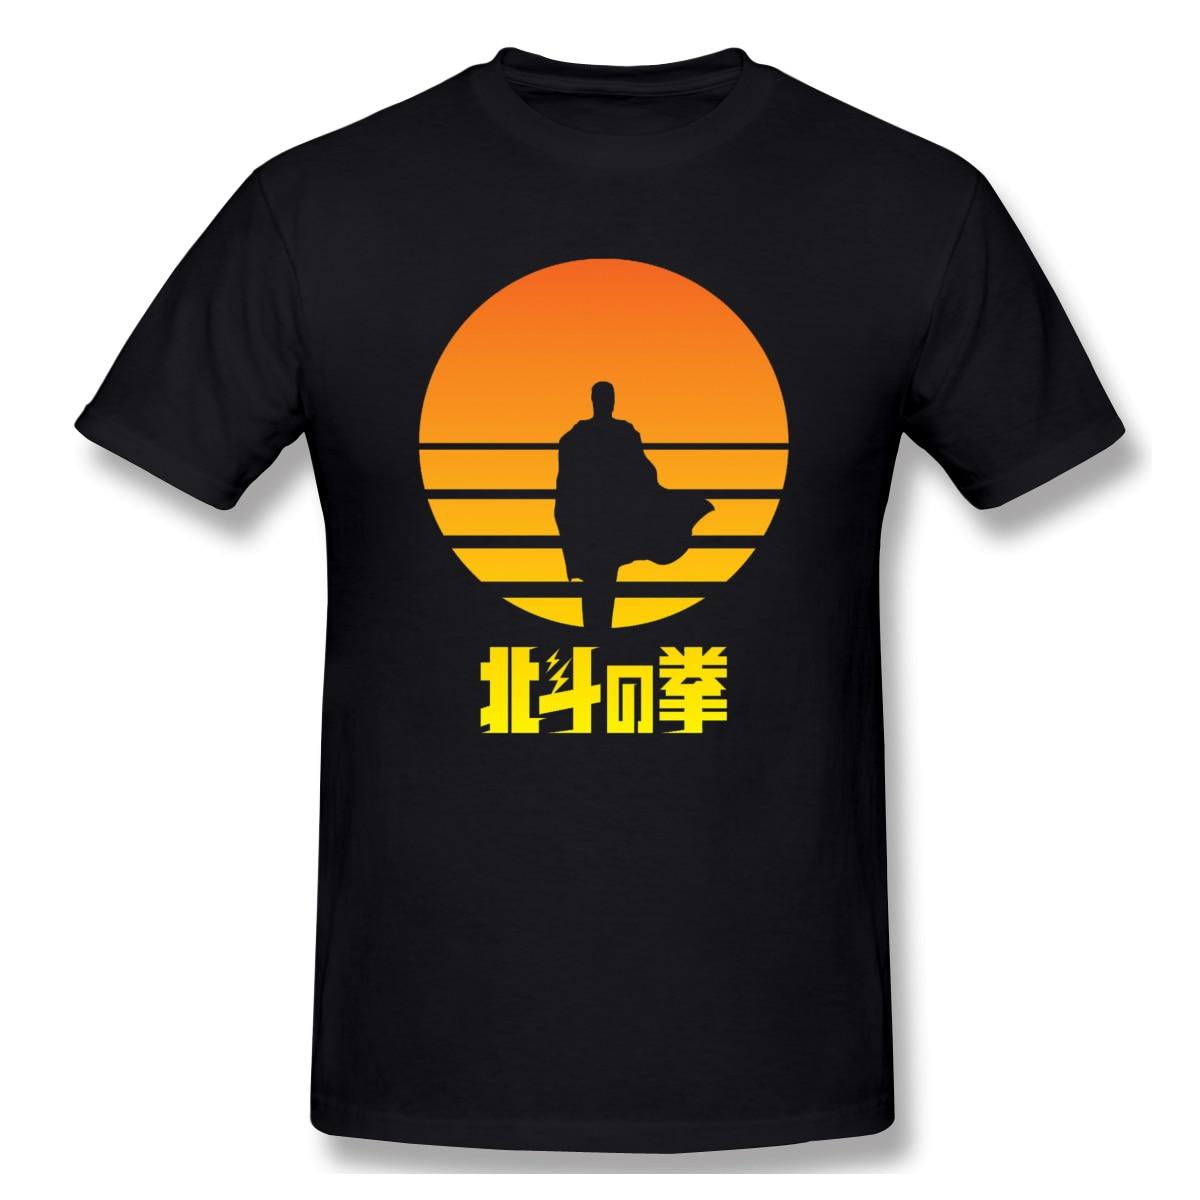 Ken Block Skull Logo Youth Boys /& Girls Crewneck Funny Short Sleeve T-Shirt